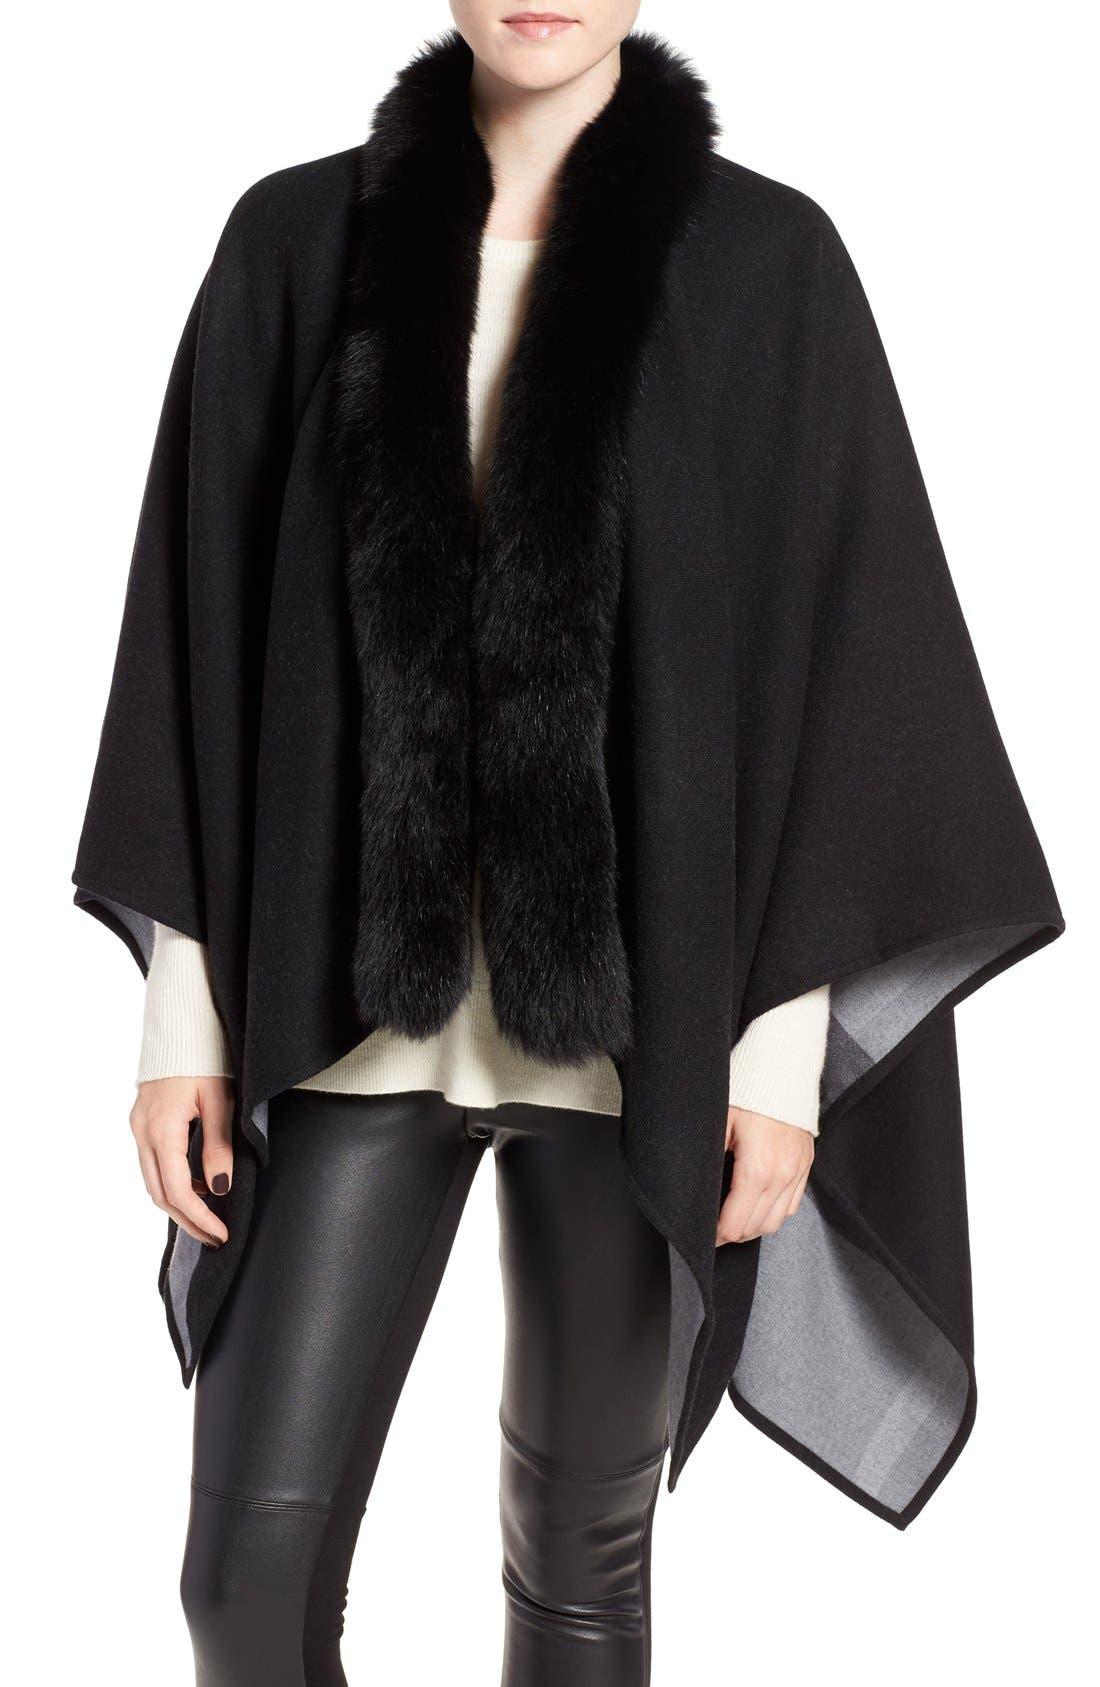 Alternate Image 1 Selected - Burberry Merino Wool Cape with Genuine Fox Fur Trim